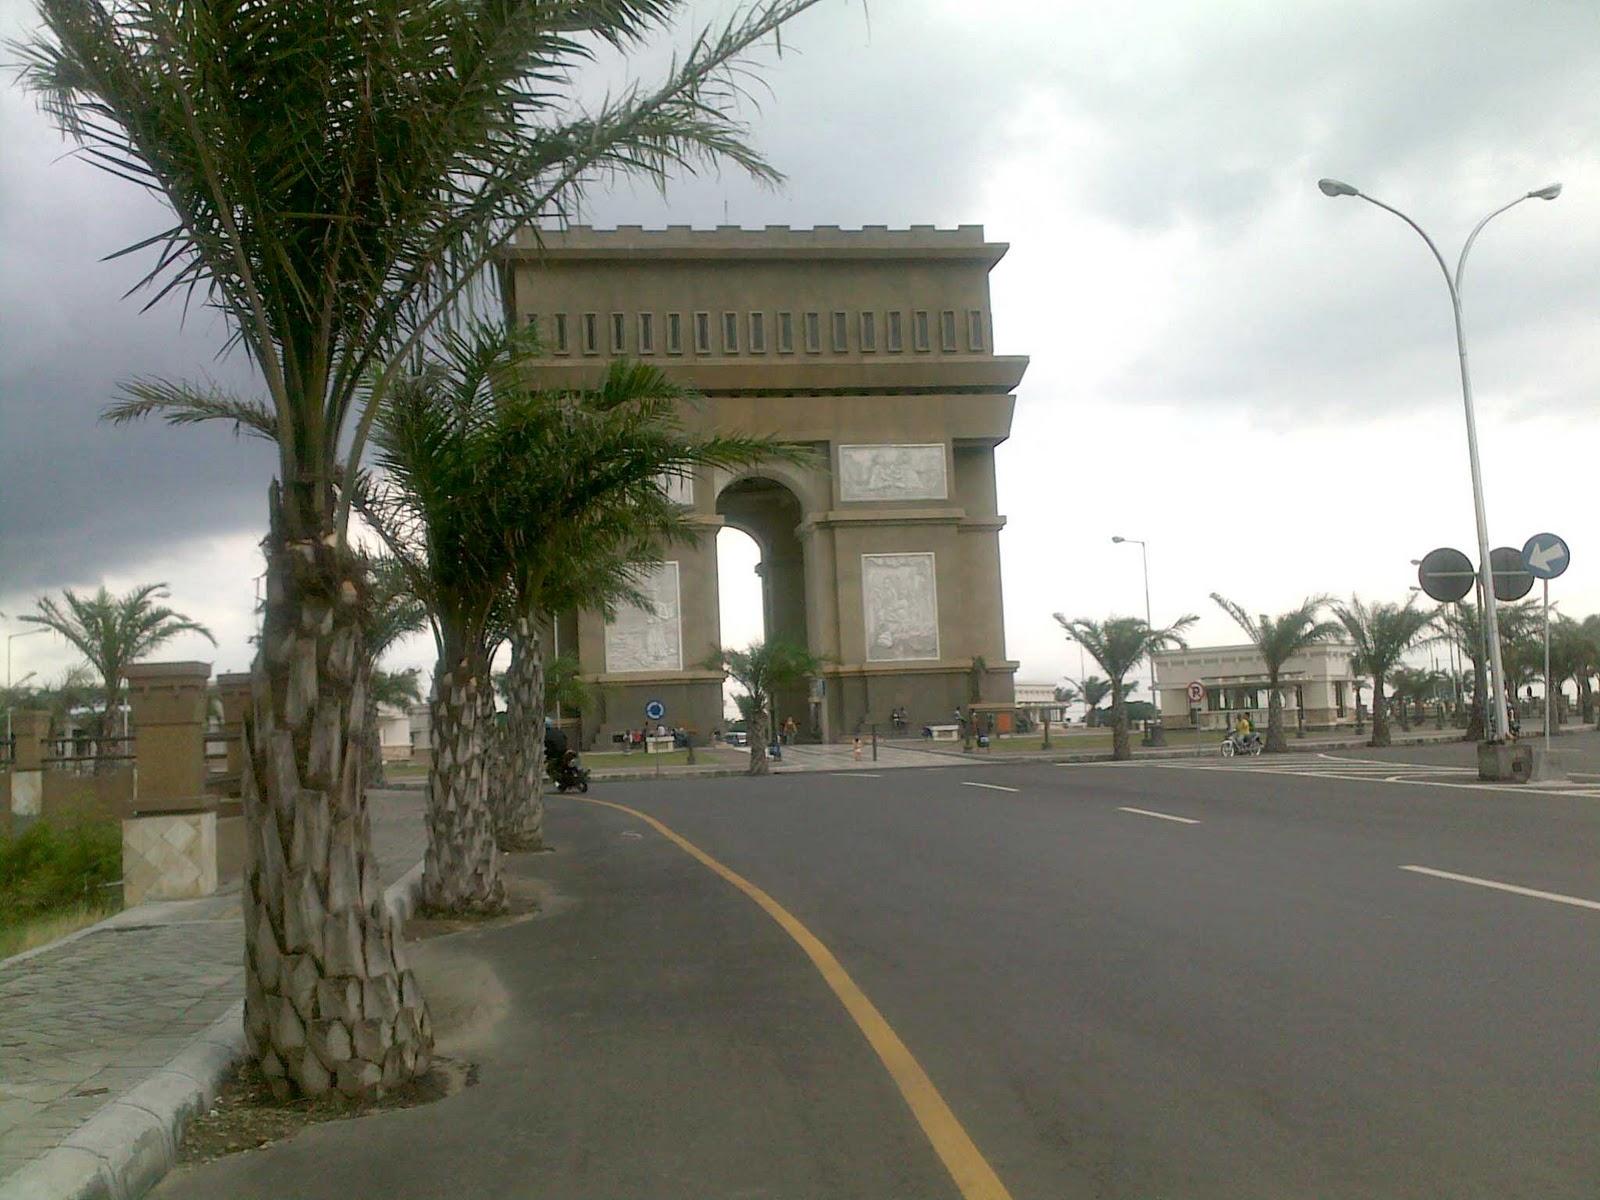 WwwHELDNEWScom The Mysteries Of Paris Monuments Moved In Kediri